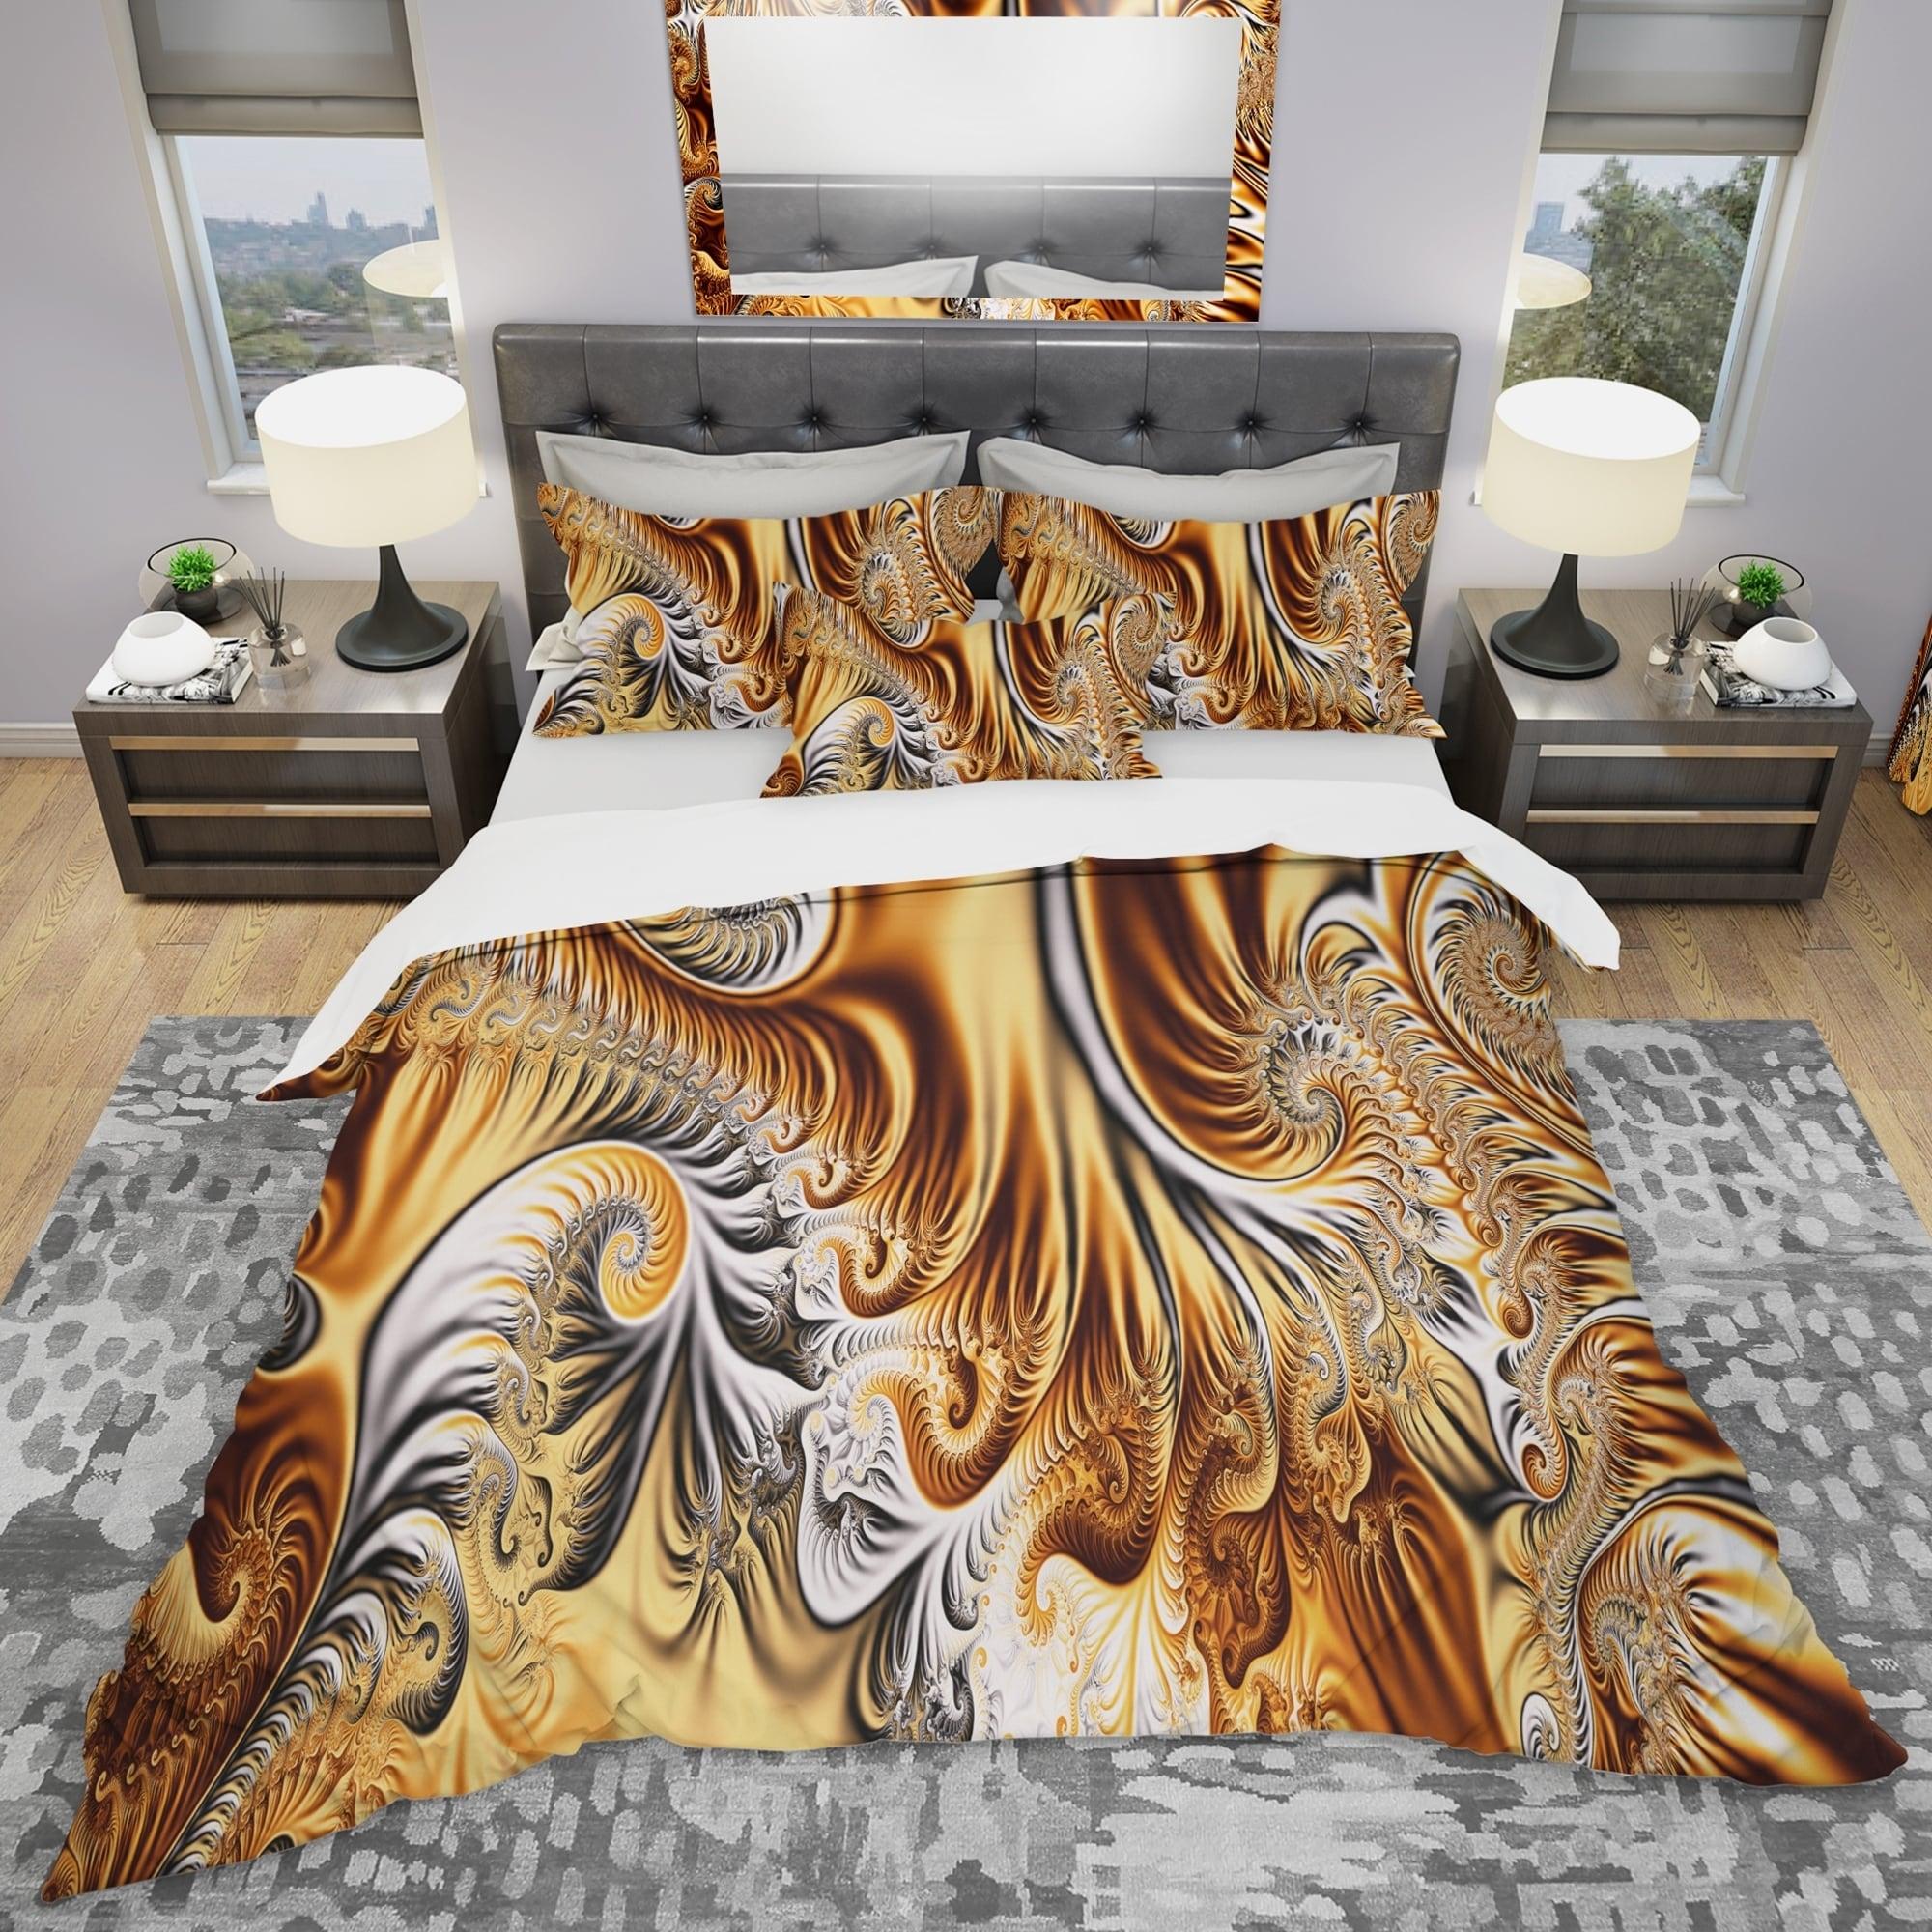 DESIGN ART Designart 'Gold & Silver Ribbons Abstract' Modern & Contemporary Bedding Set - Duvet Cover & Shams